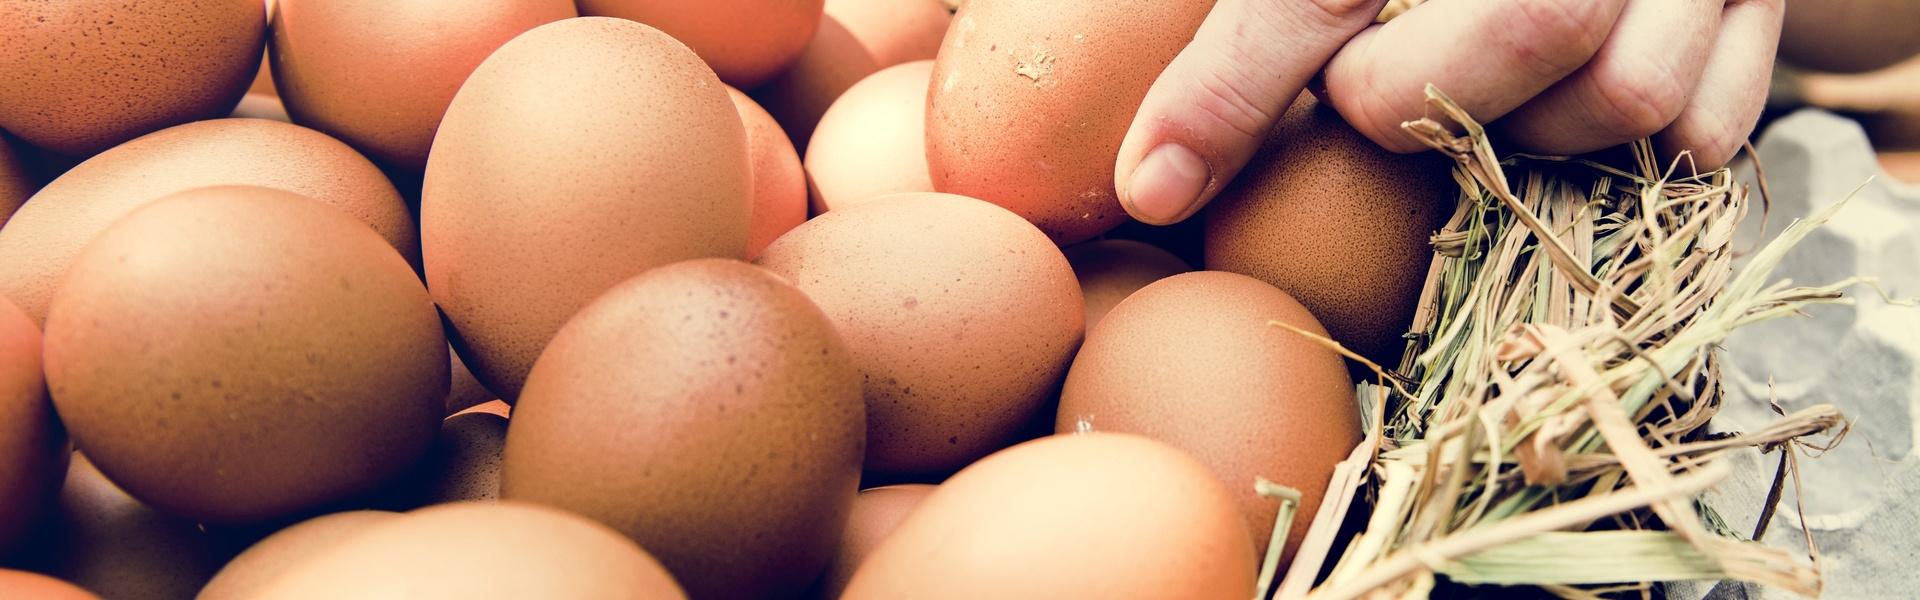 Jeden Tag - Eier